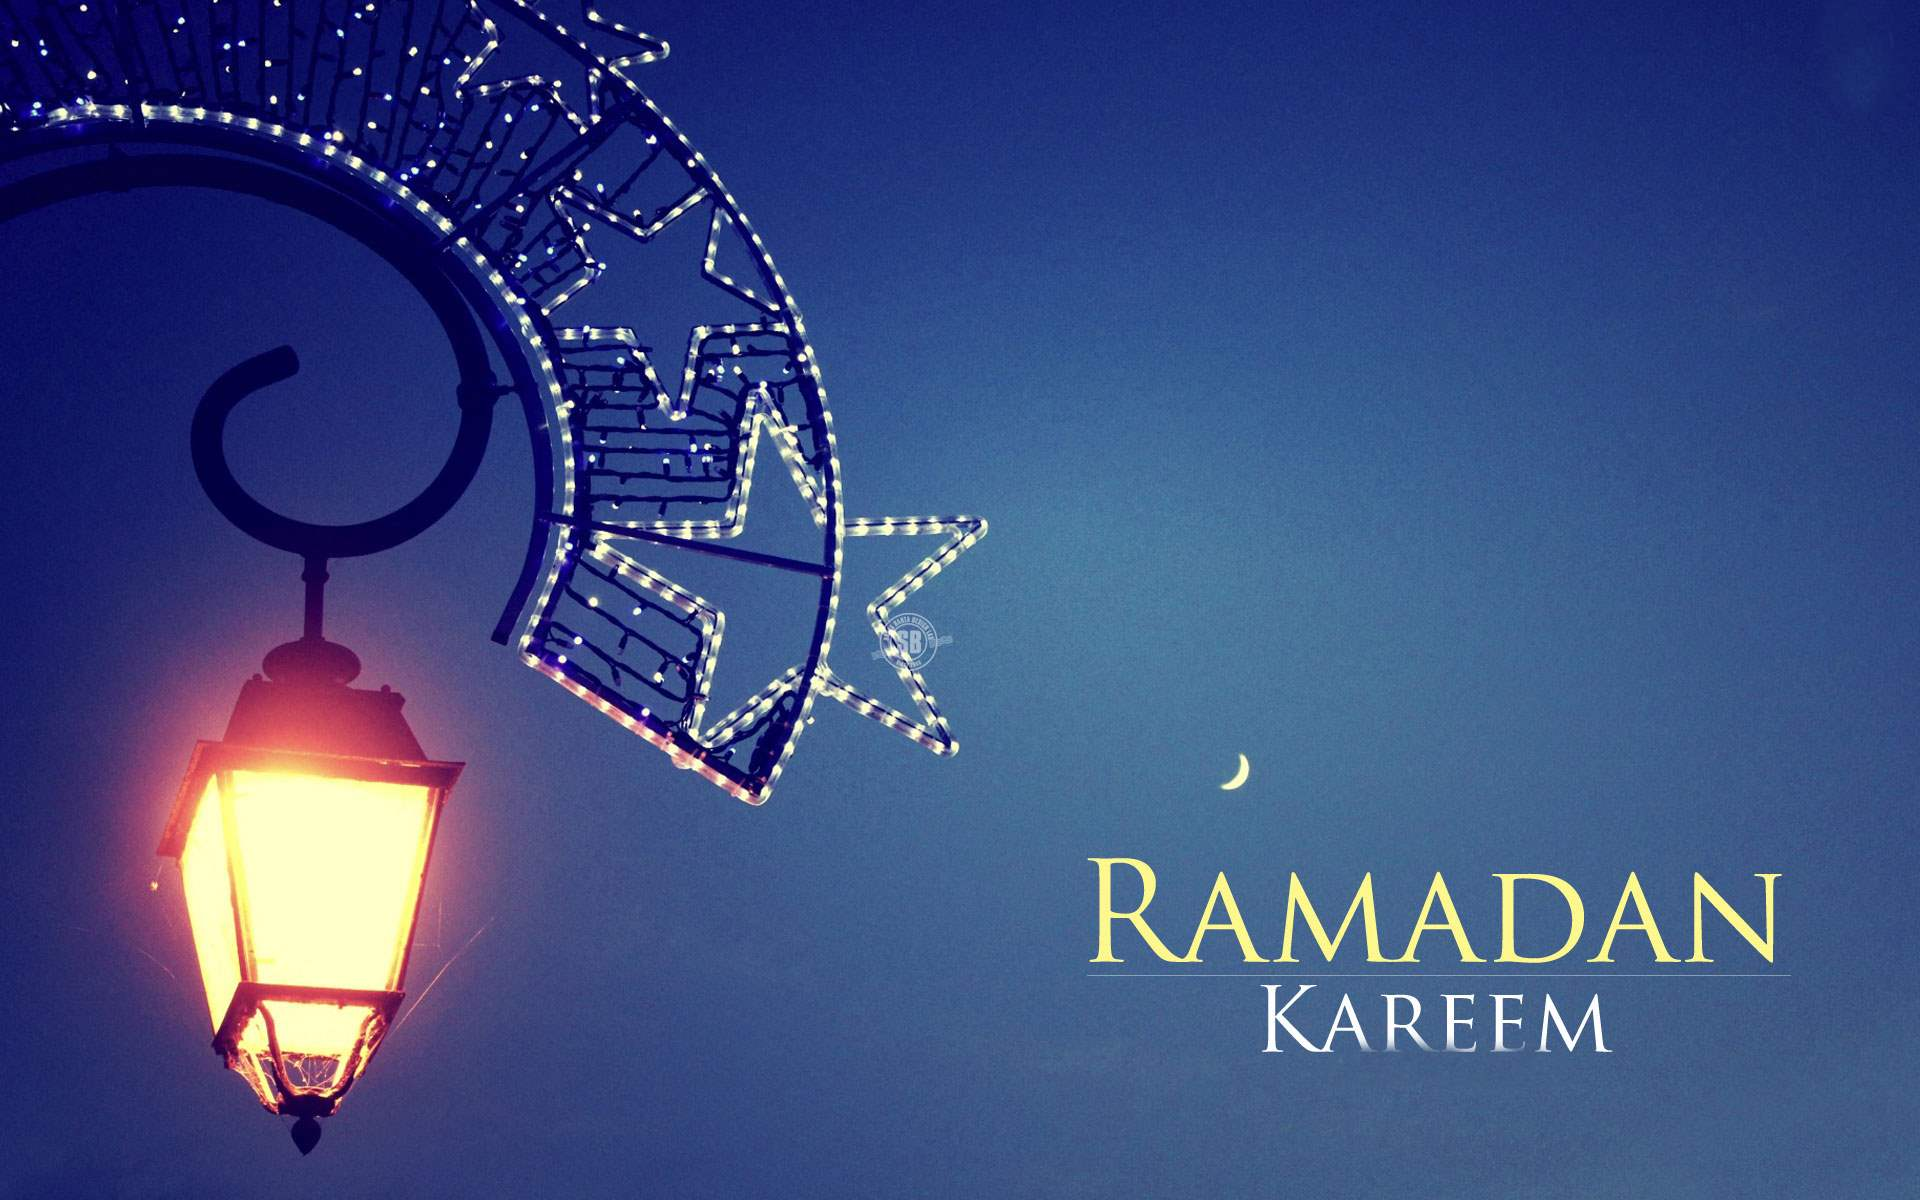 Ramadan 2015 Wallpapers designsmag 31 1920x1200